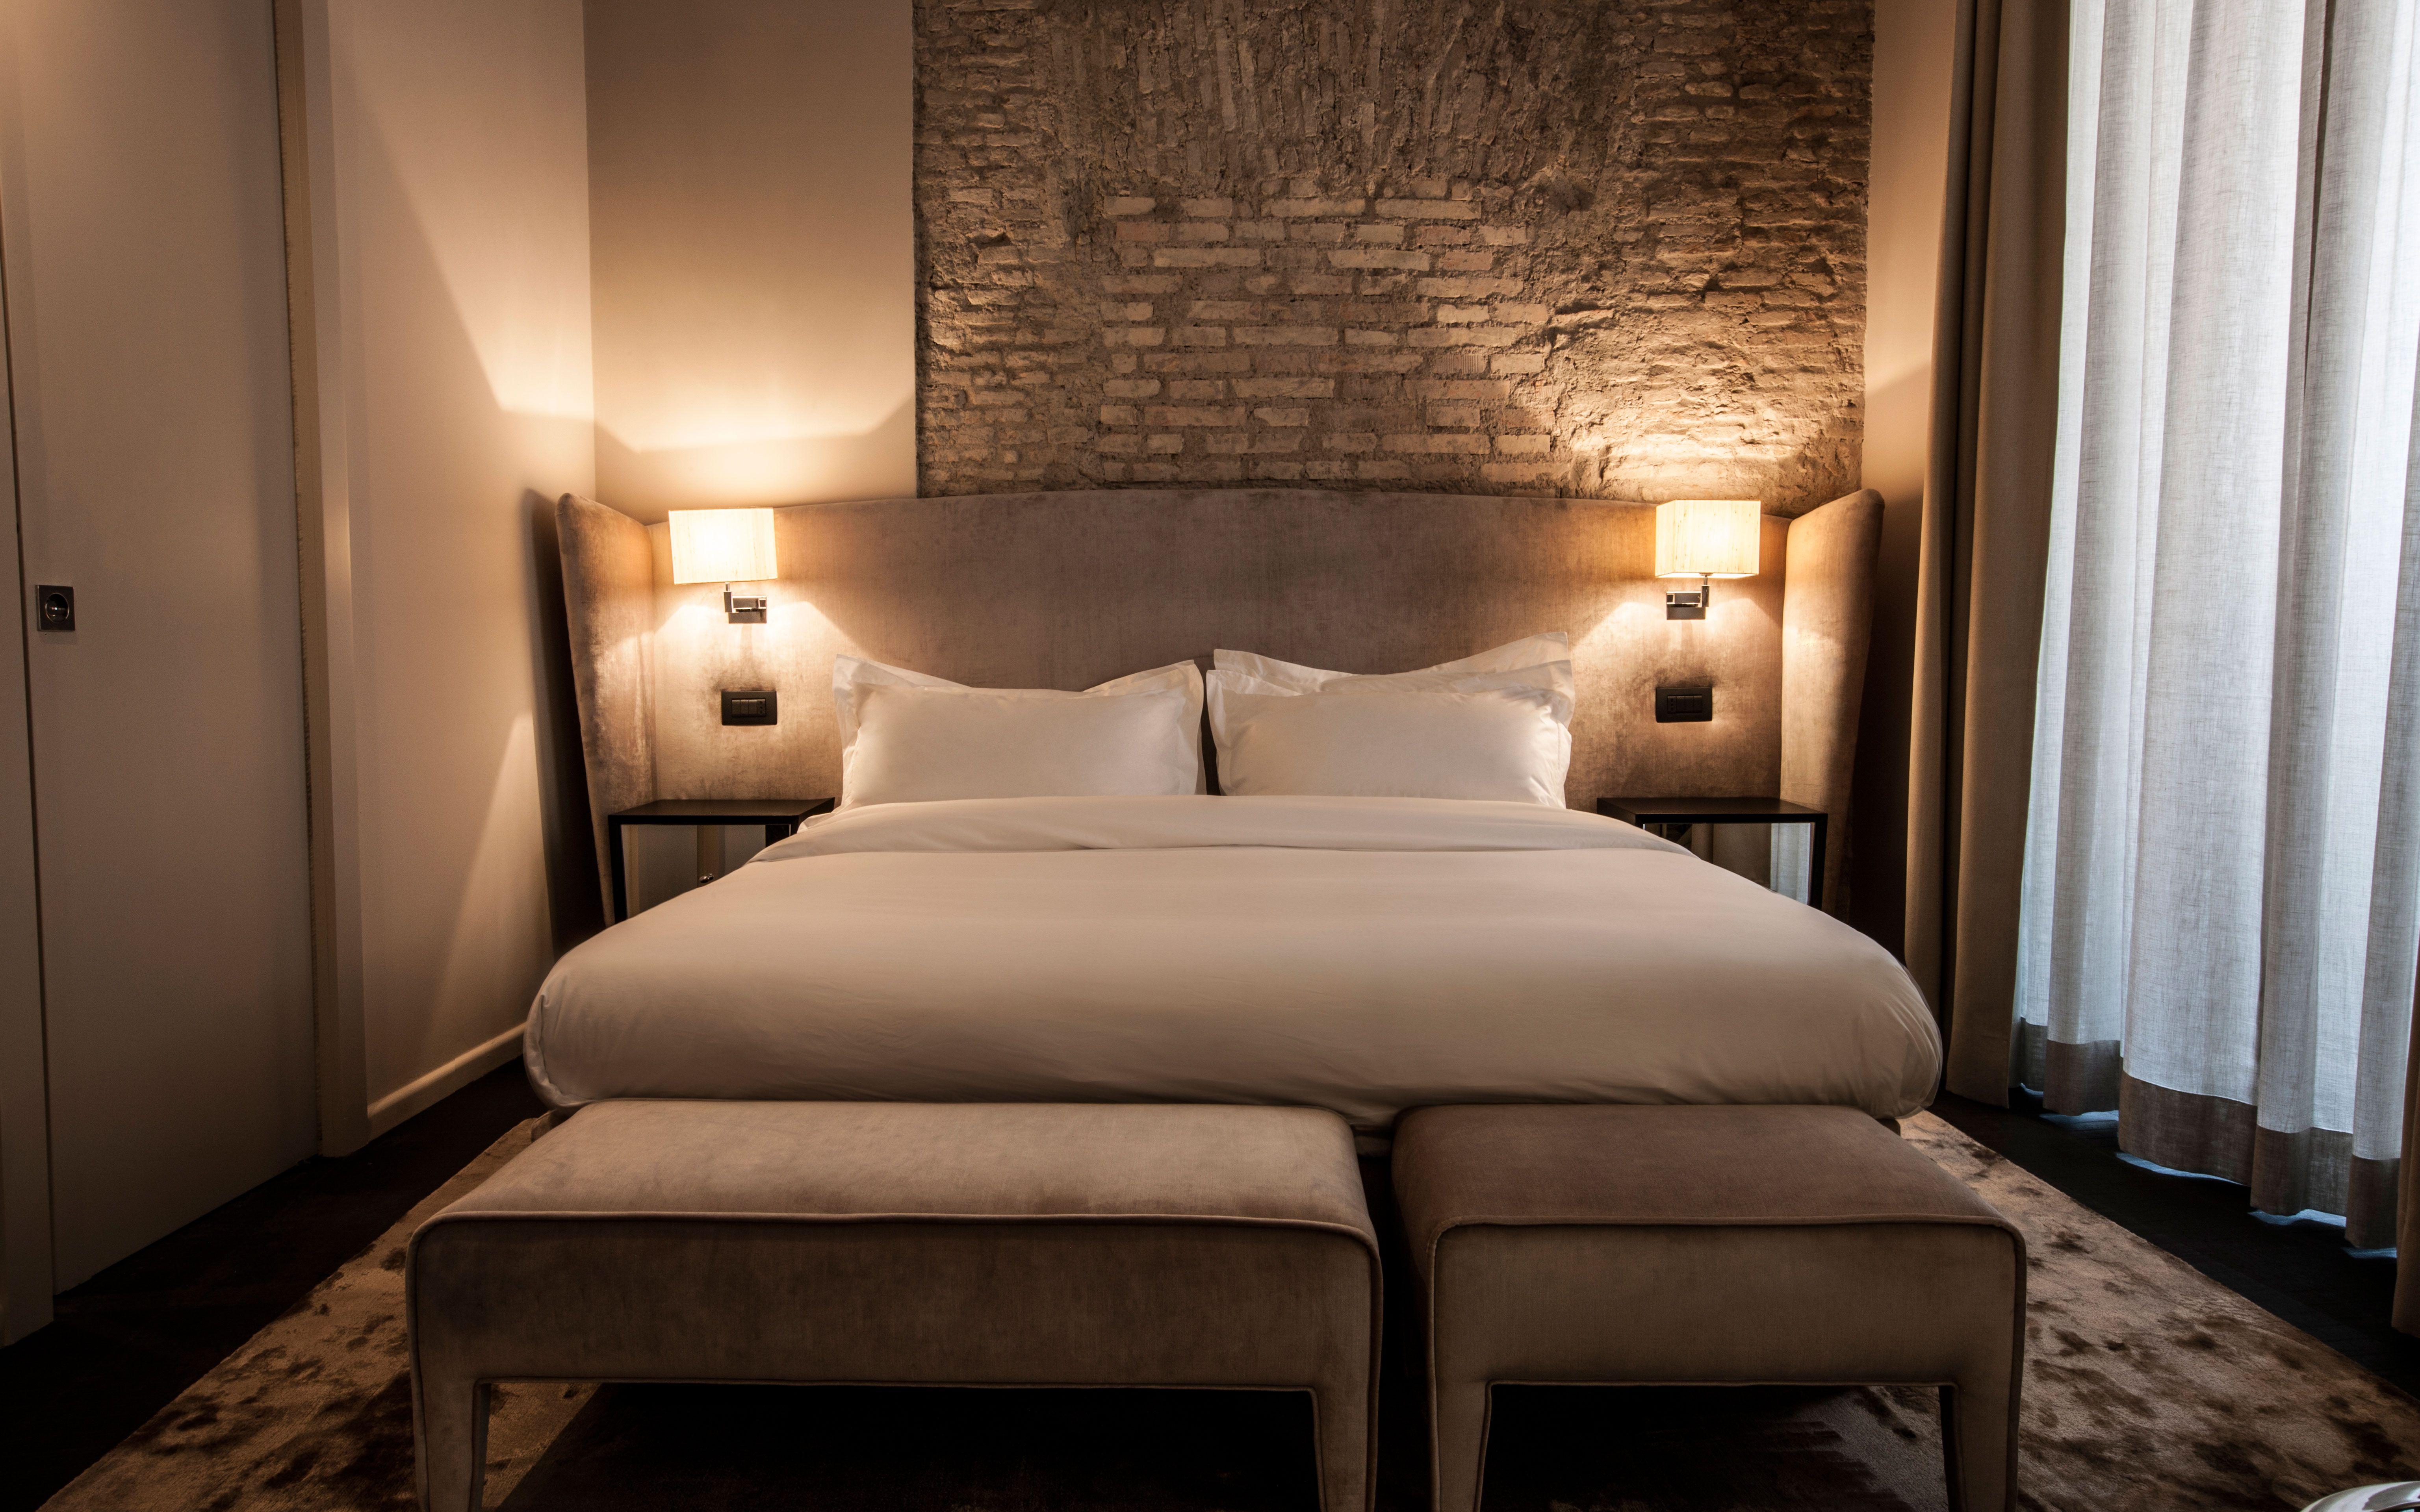 Meet The Stylish New Hotels Reimagining Rome